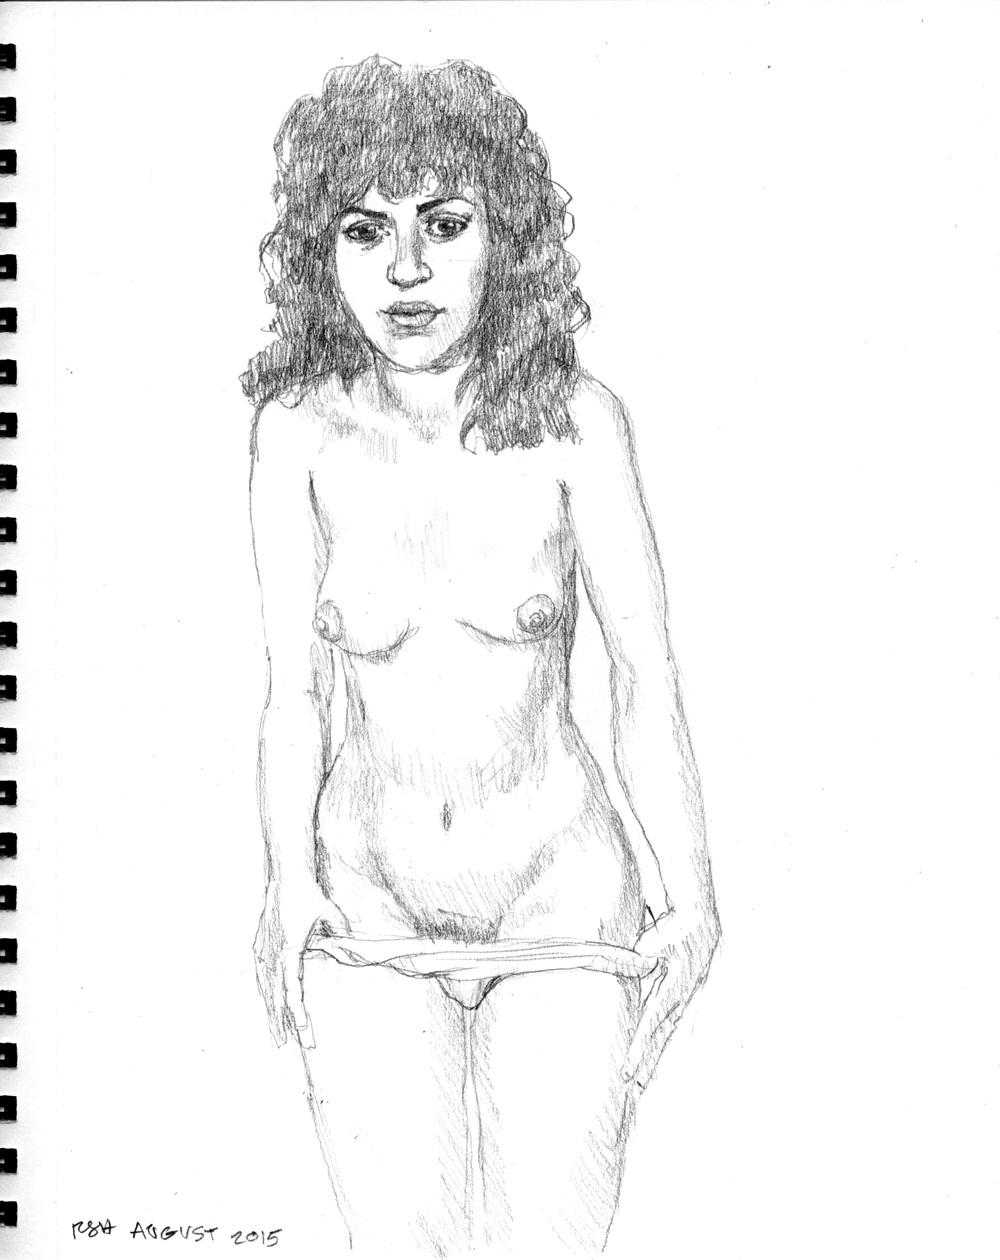 August-sept 2015 sketches_279.jpg